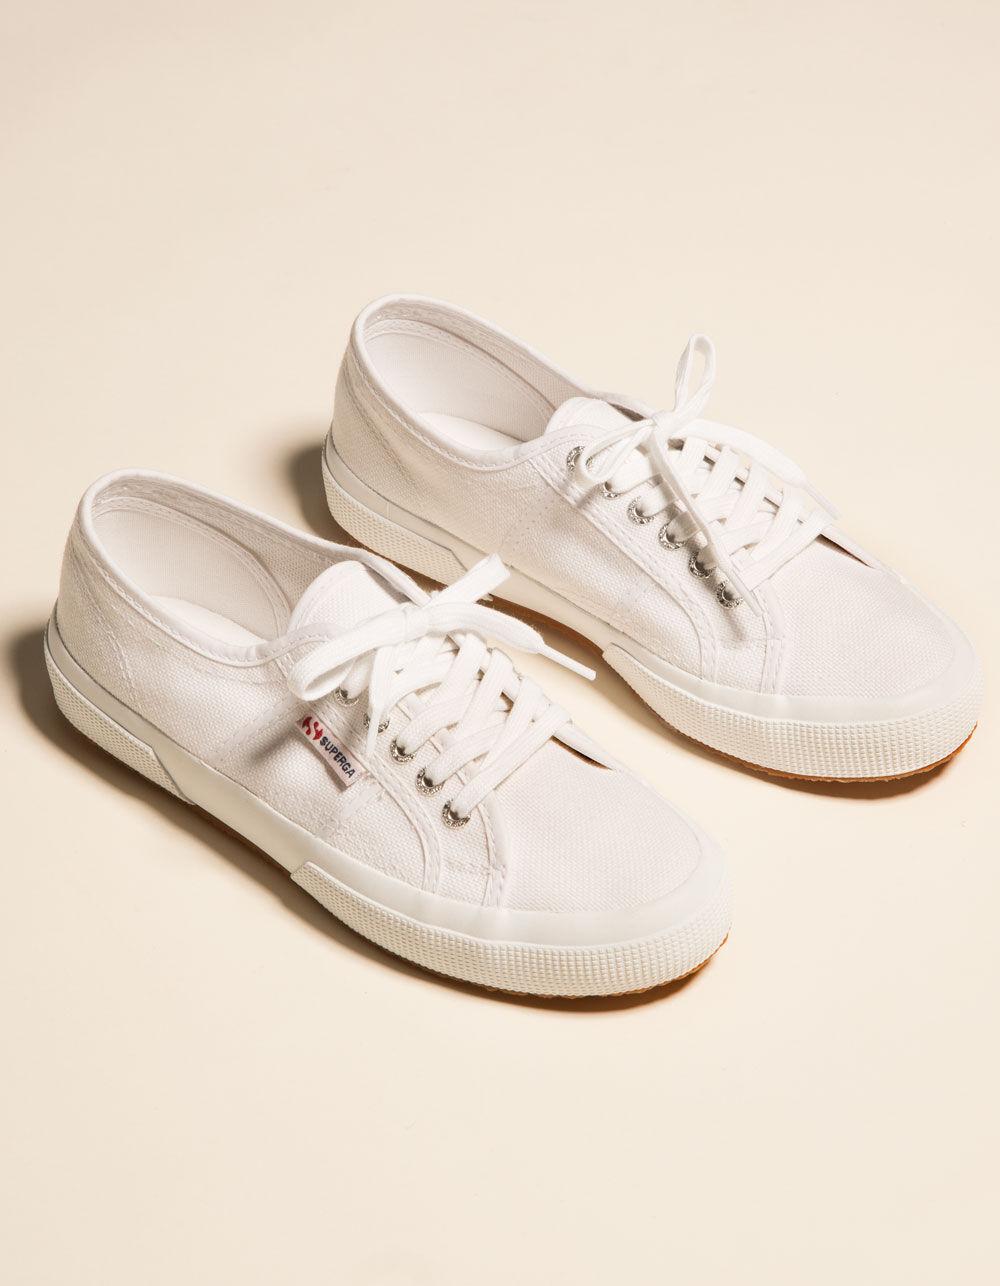 SUPERGA 2750 Cotu Classic White Shoes